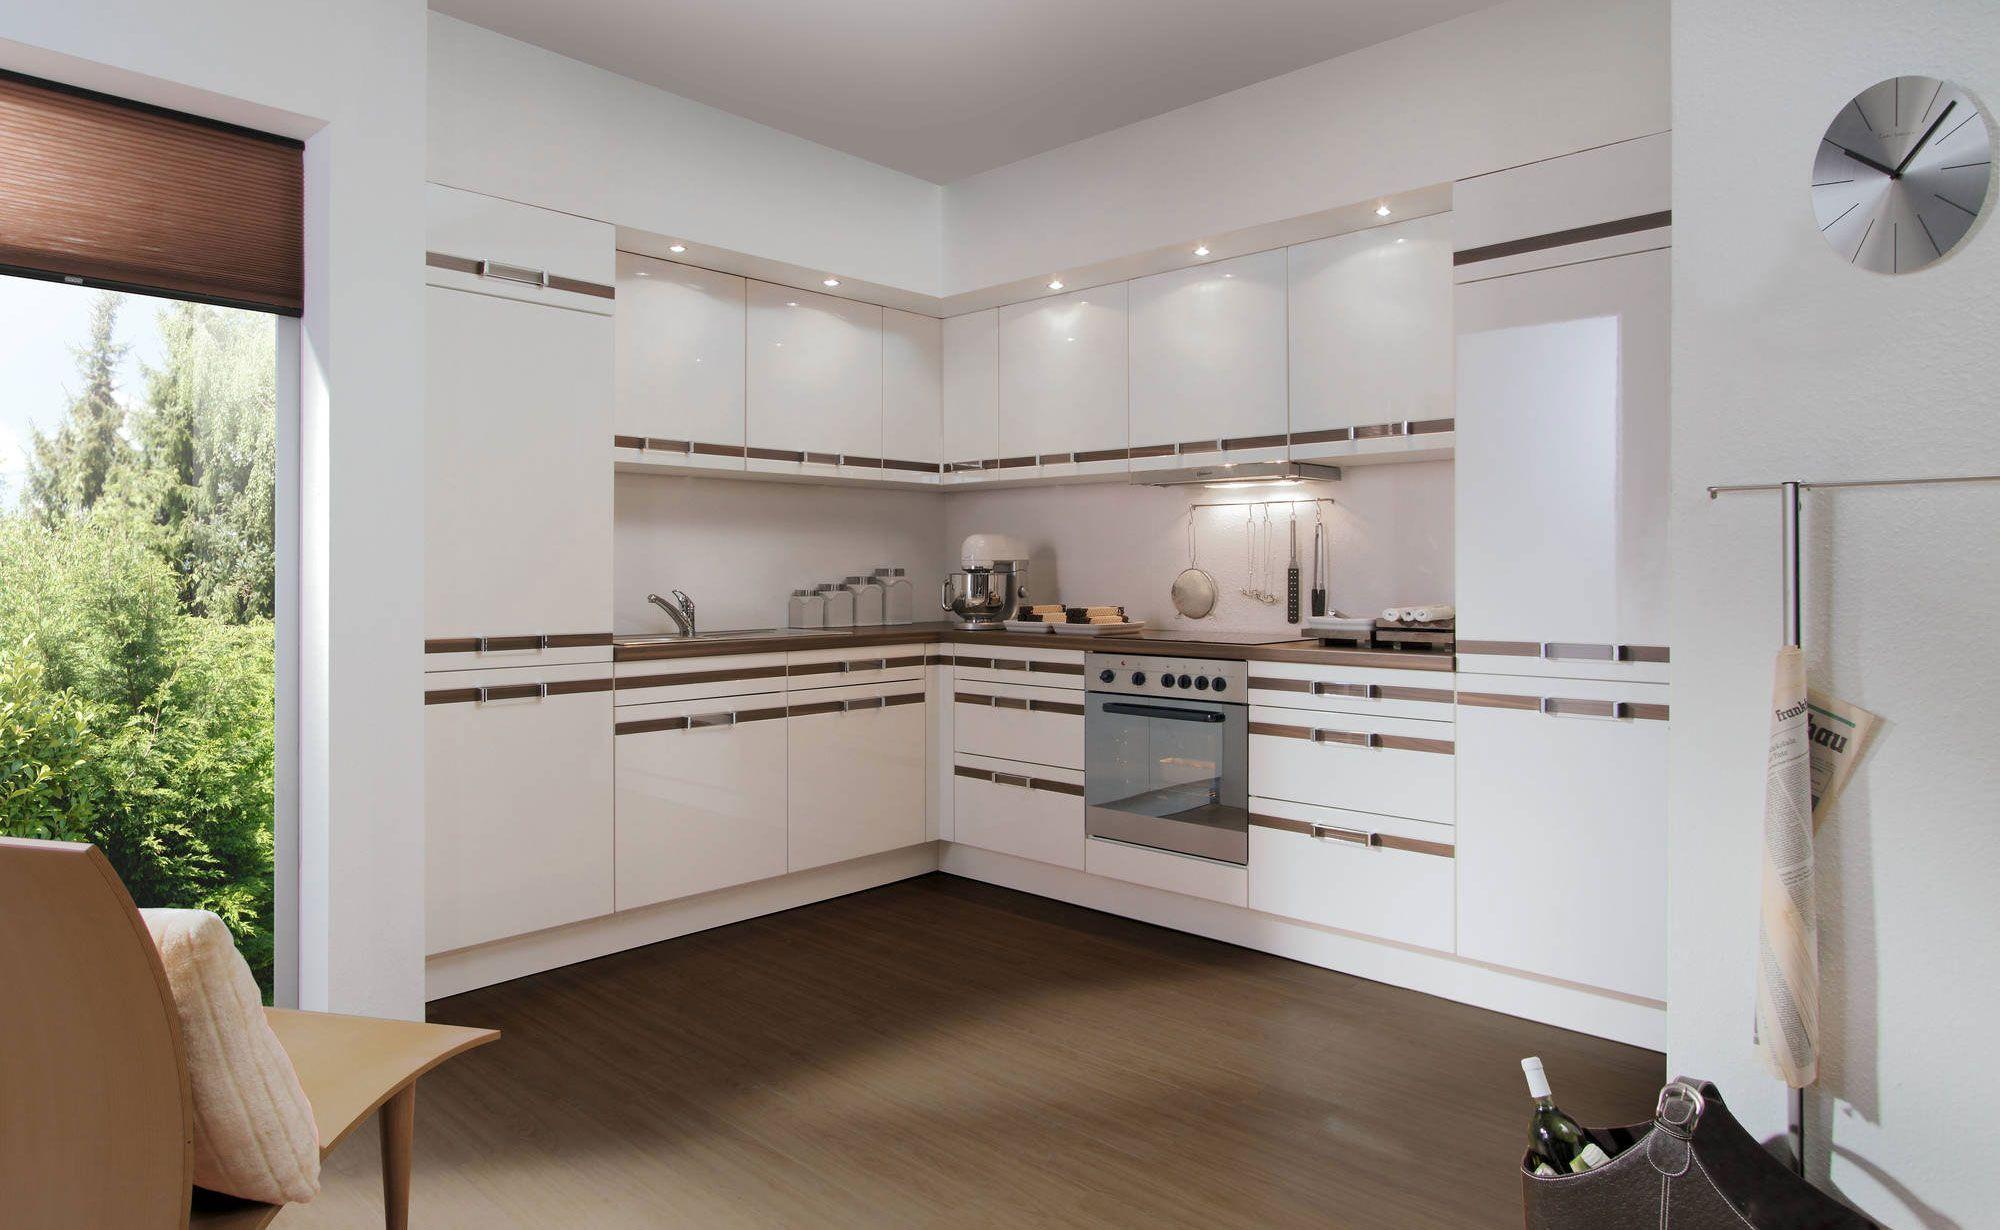 Full Size of Segmüller Küchen Segmller Kche Erweitern Umzug Ikea Oder Planen Tapete Modern Küche Regal Wohnzimmer Segmüller Küchen